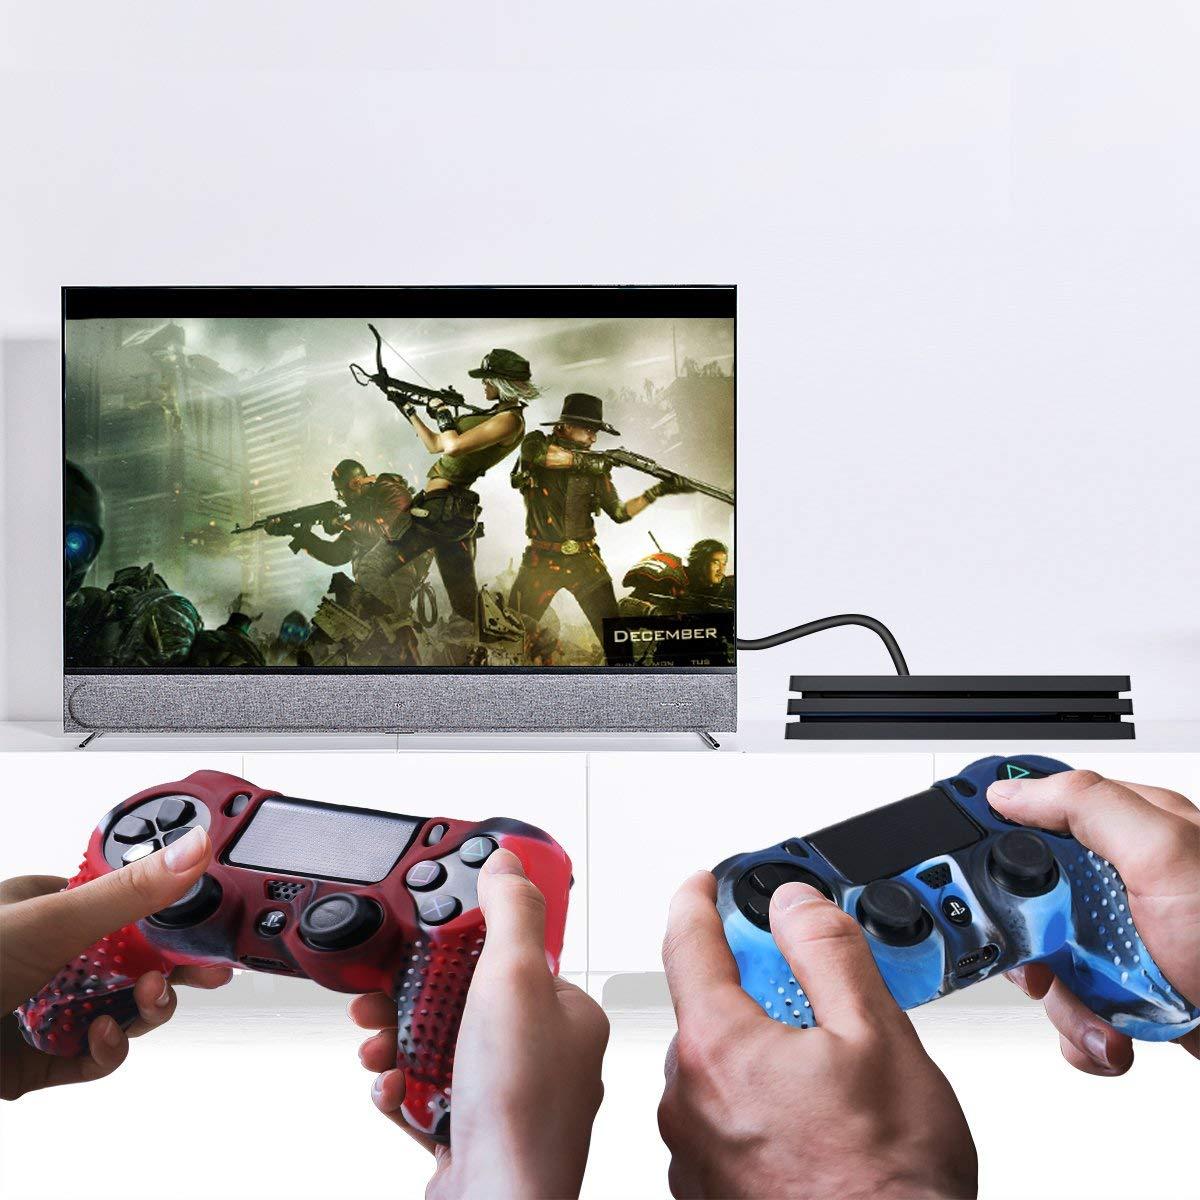 Купить с кэшбэком Yoteen 13 In 1 for PS4 Controller Case Silicone Unti-slip Dot Joystick Cap Light Bar Sticker and Dualshock 4 Charging Dock